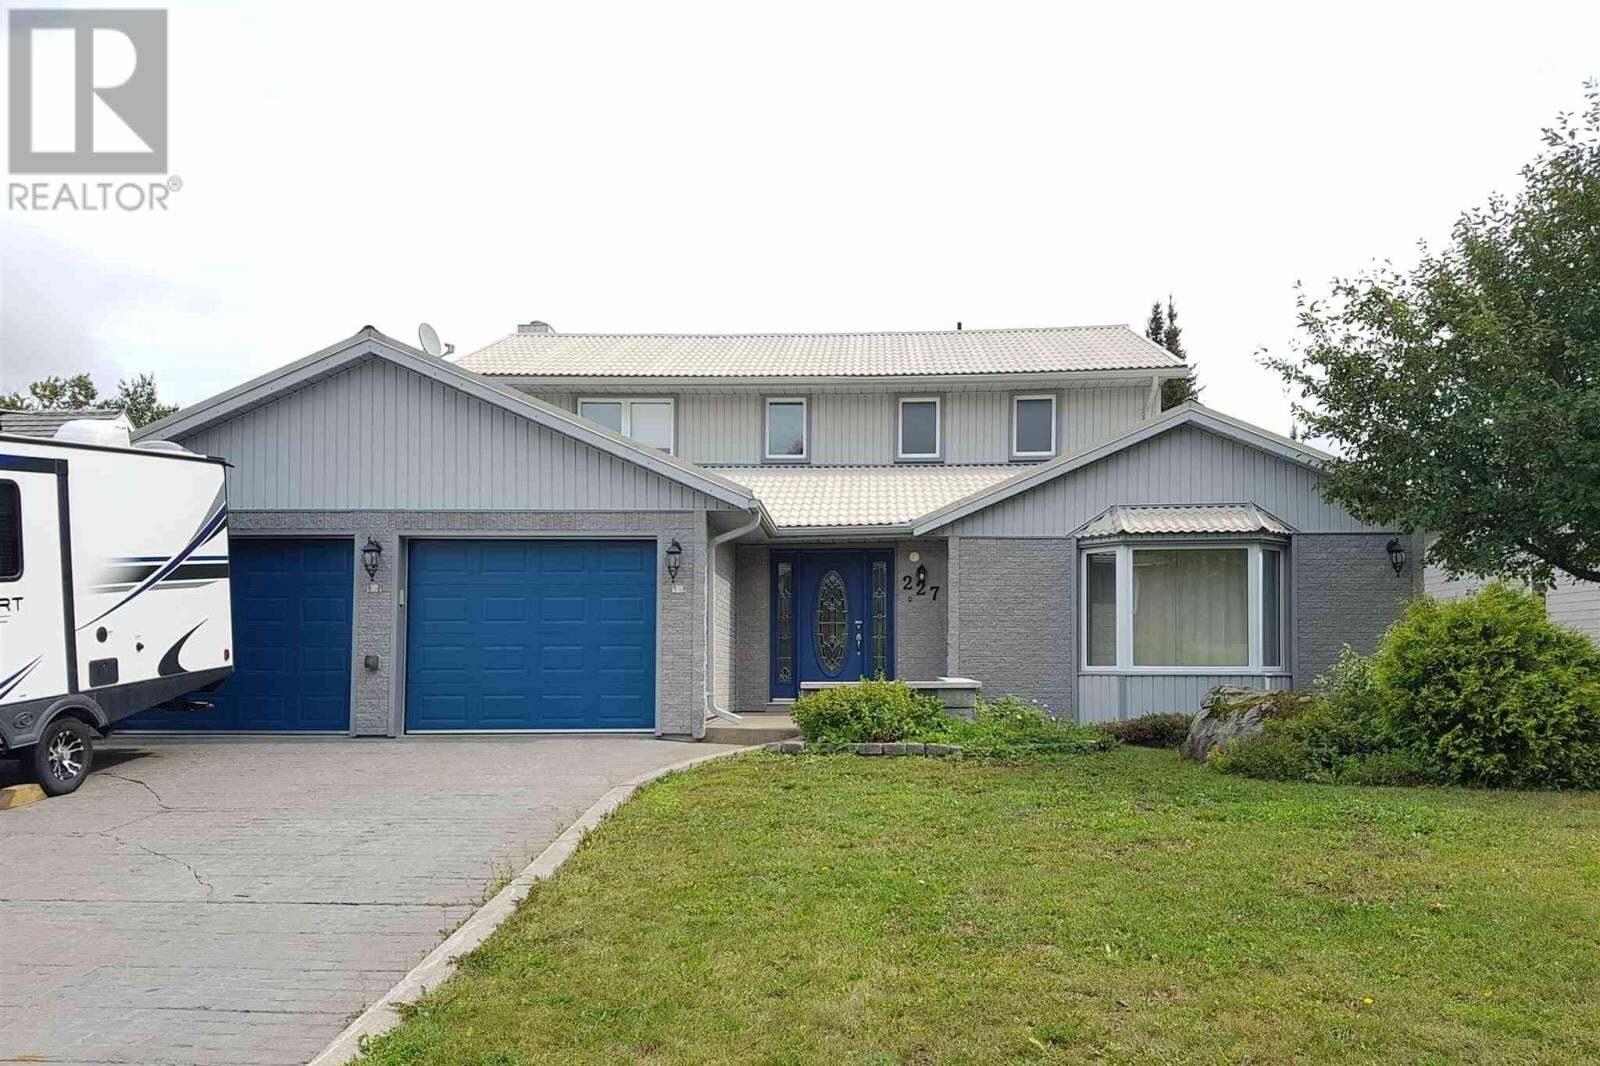 House for sale at 227 Cosman Cres Temiskaming Shores Ontario - MLS: TM201831